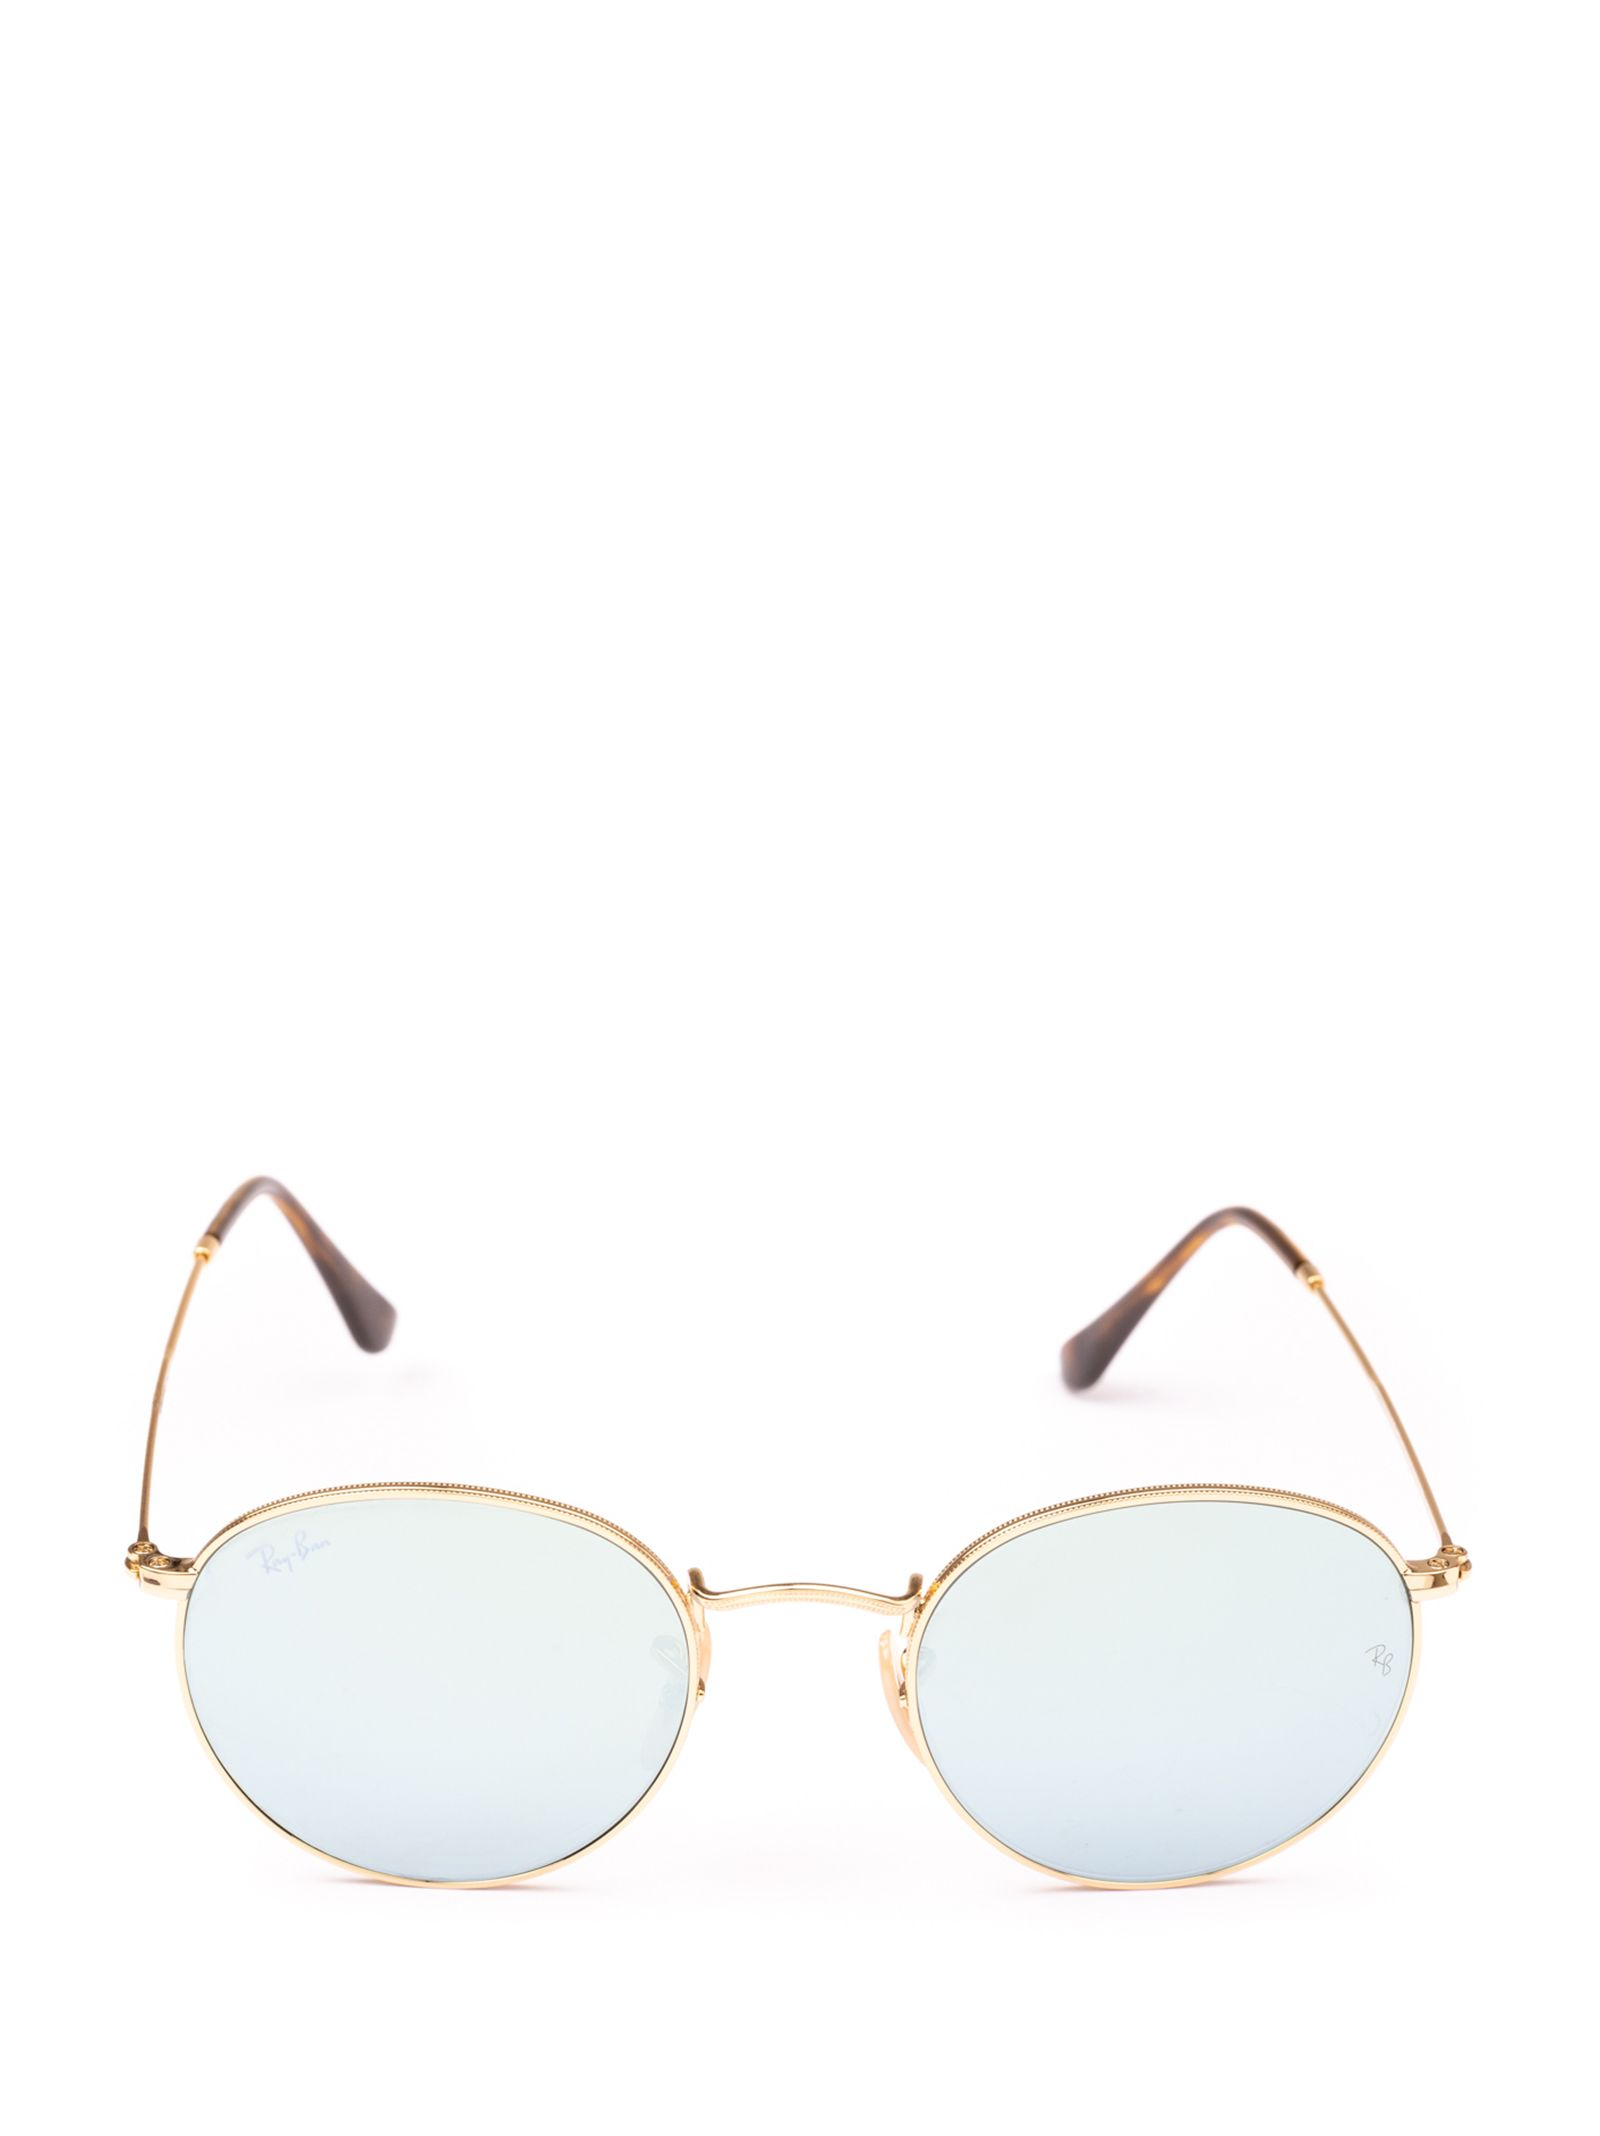 shop ray ban sunglasses in 001 30 Polarized Ray-Ban Sale ray ban sunglasses